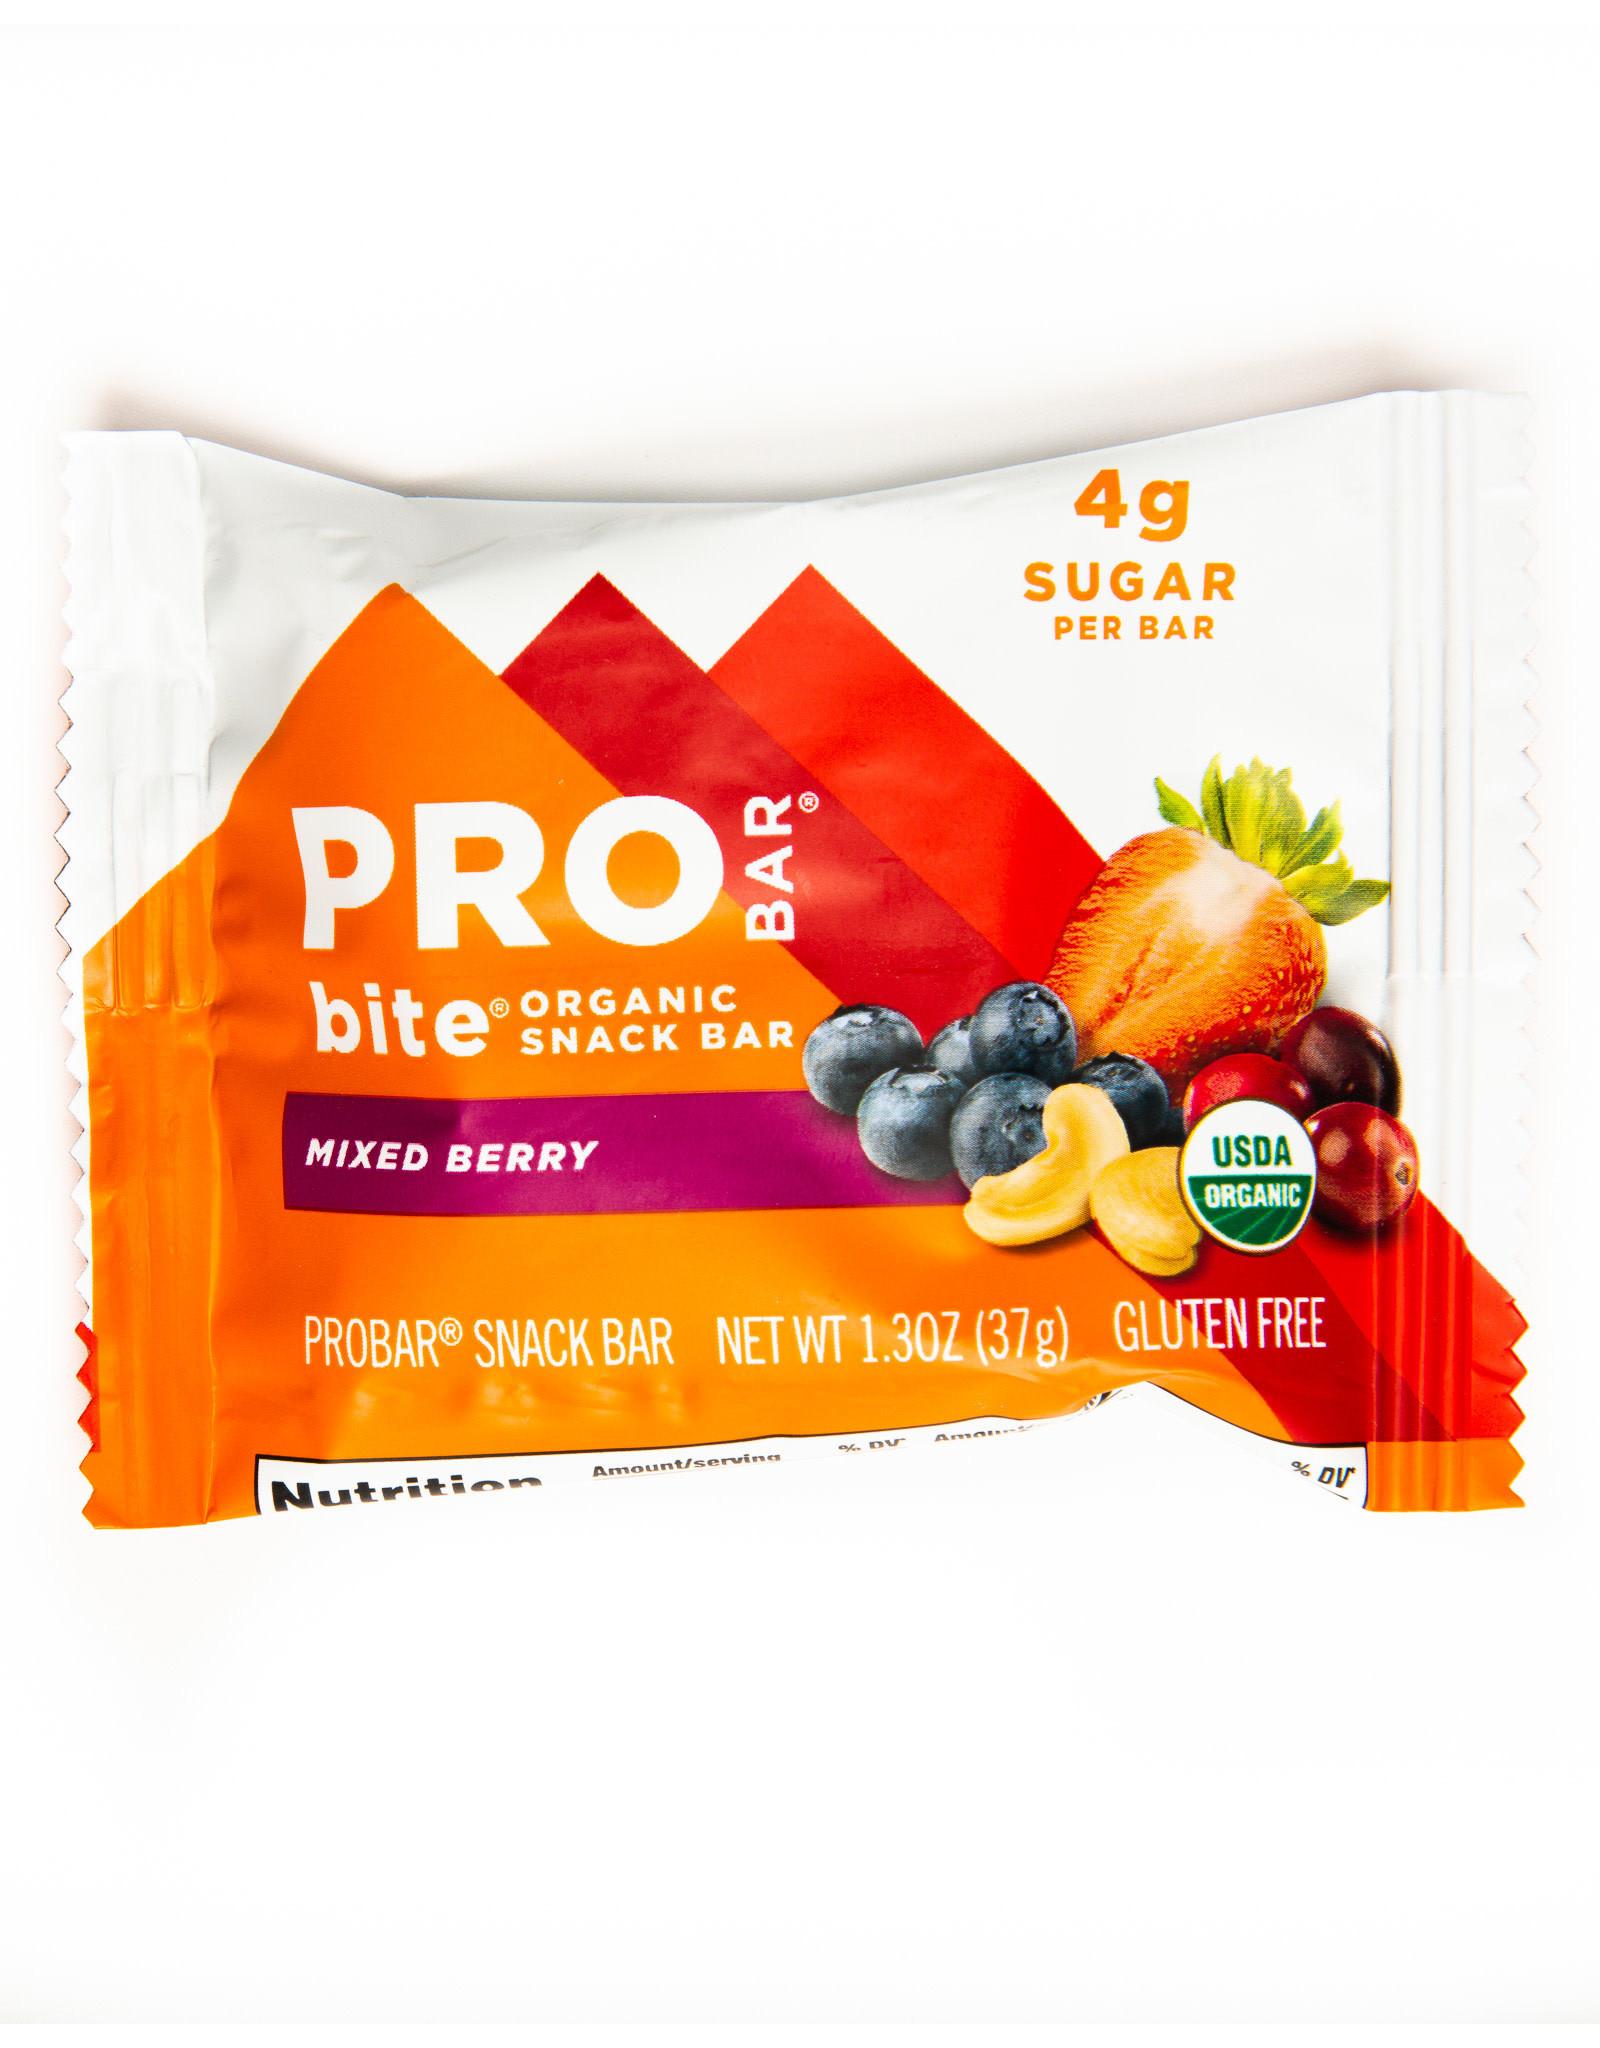 ProBar ProBar Bite Bar: Mixed Berry, single